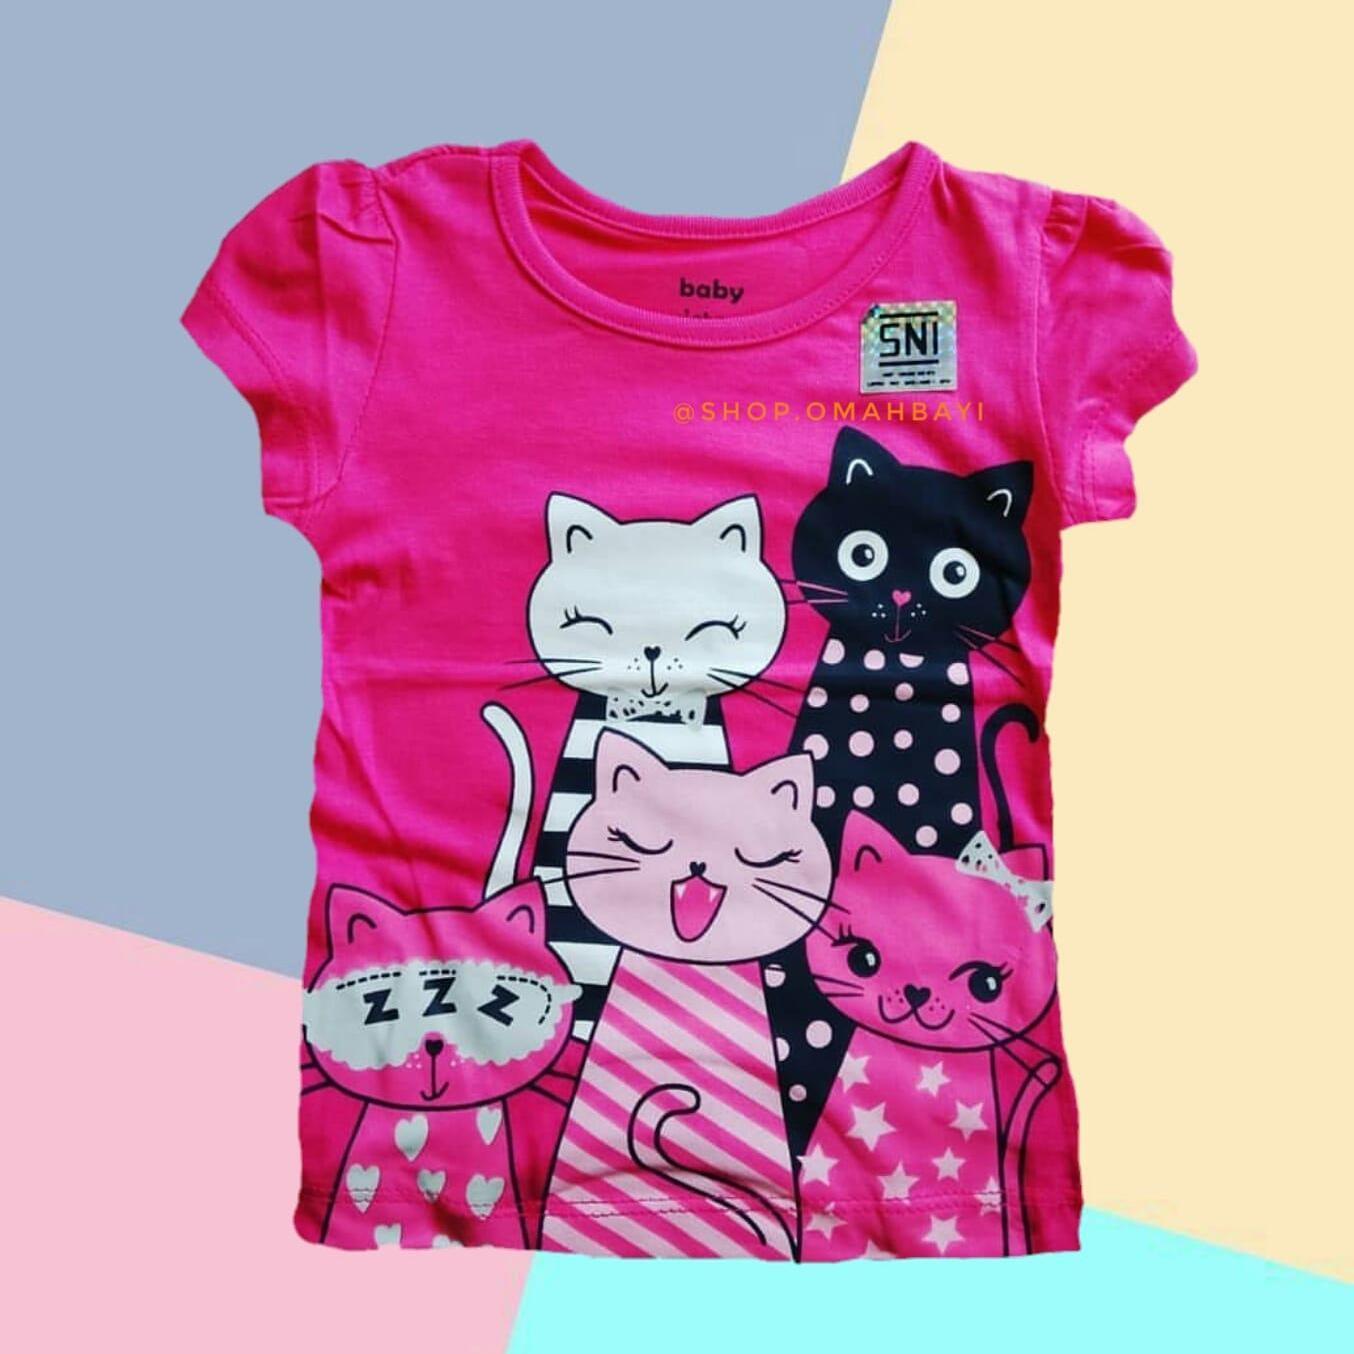 Kaos Anak Perempuan Baby Victory 1 - 2 - 3 Tahun Motif Cerah Mix RANDOM